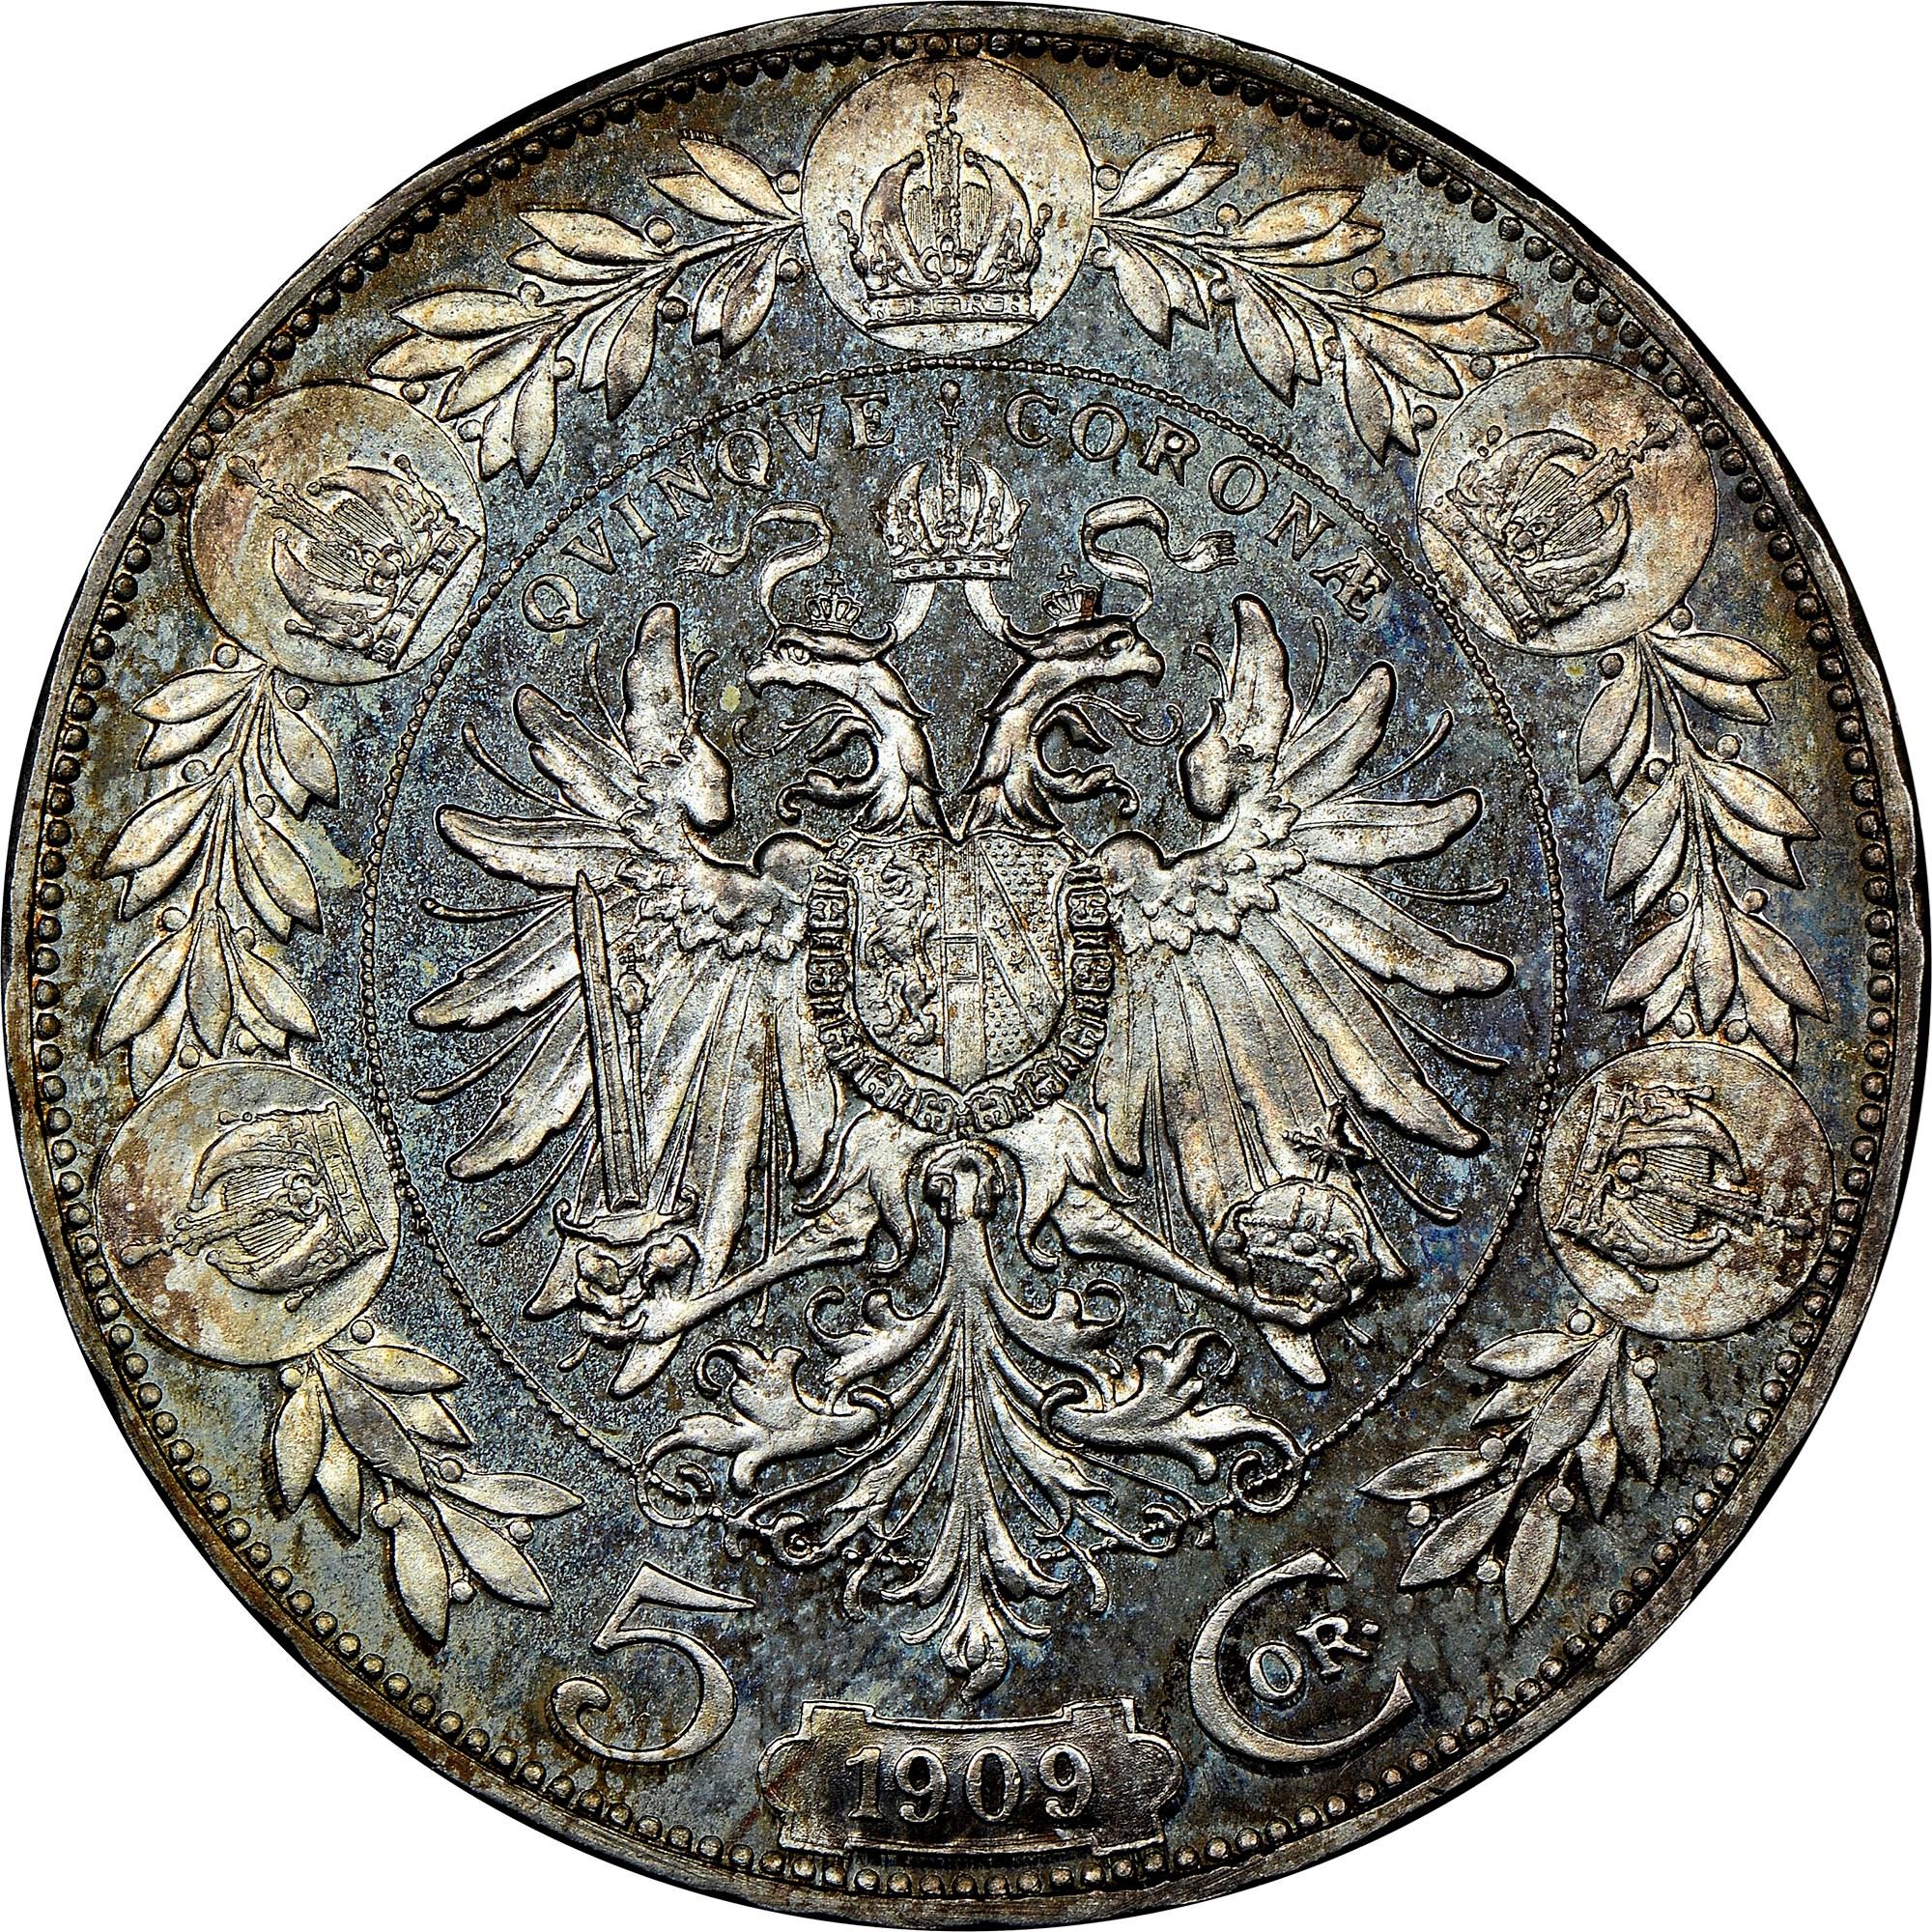 Austria 5 Corona reverse